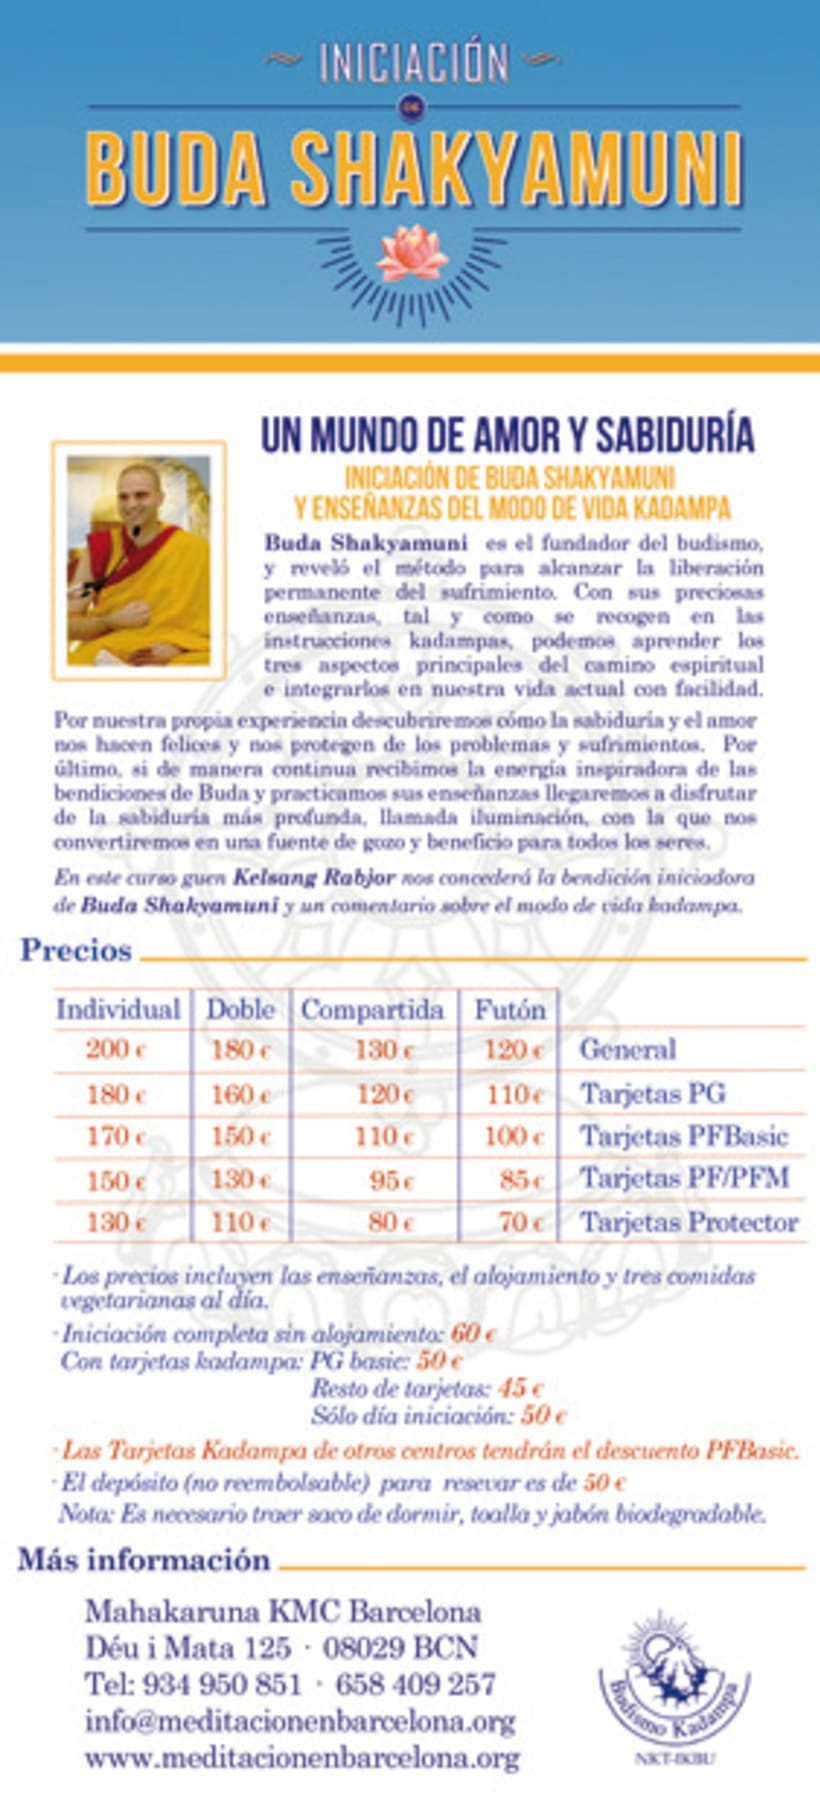 MAHAKARUNA KMC Barcelona Centre de Meditació 2